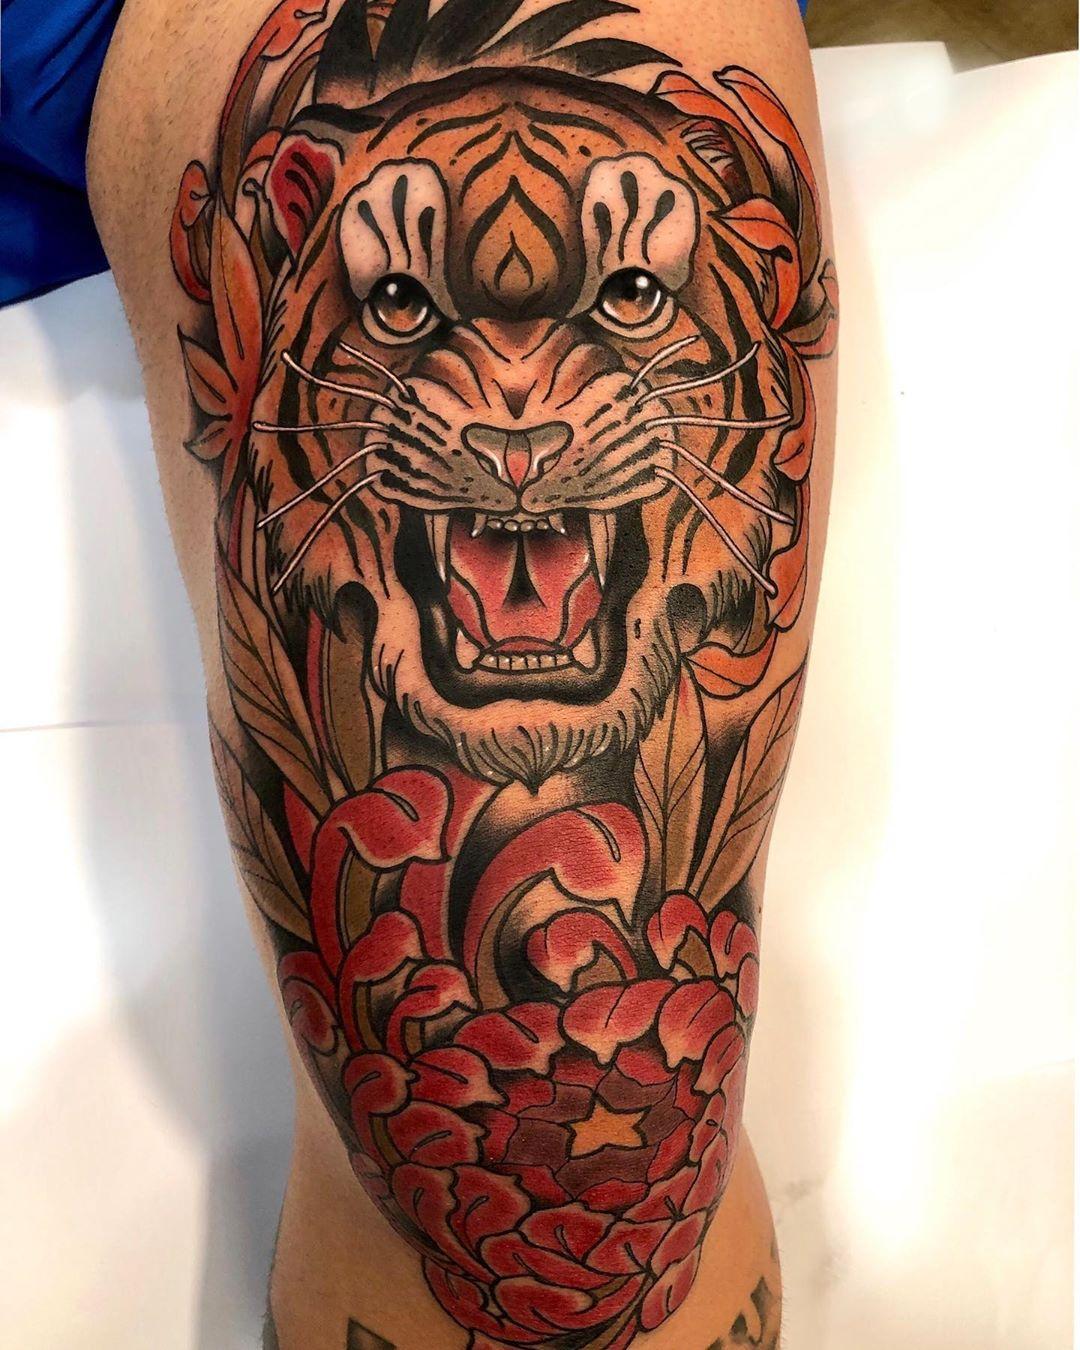 followforfollow,berlin,followmeciudadreal,ciudadreal,tomelloso,almagro,puertollano,tatuajesenpuertollano,tatuajesendaimiel,ciudadrealtattoo,ciudadrealtatuajes,tatuajesciudadreal,follow,ciudadrealtatuajes,puertollano,tattooers,besttattooers,juantabasco,ciudadrealsetatua,ink,tatuajes,realiismo,realistictattoo,ciudadrealtattoo,tatuajesenpuertollano,traditionaltattoos,castillalamancha,ink,tattooart,zurichtattoo,daimiel,inkedgirls,inkig,ink